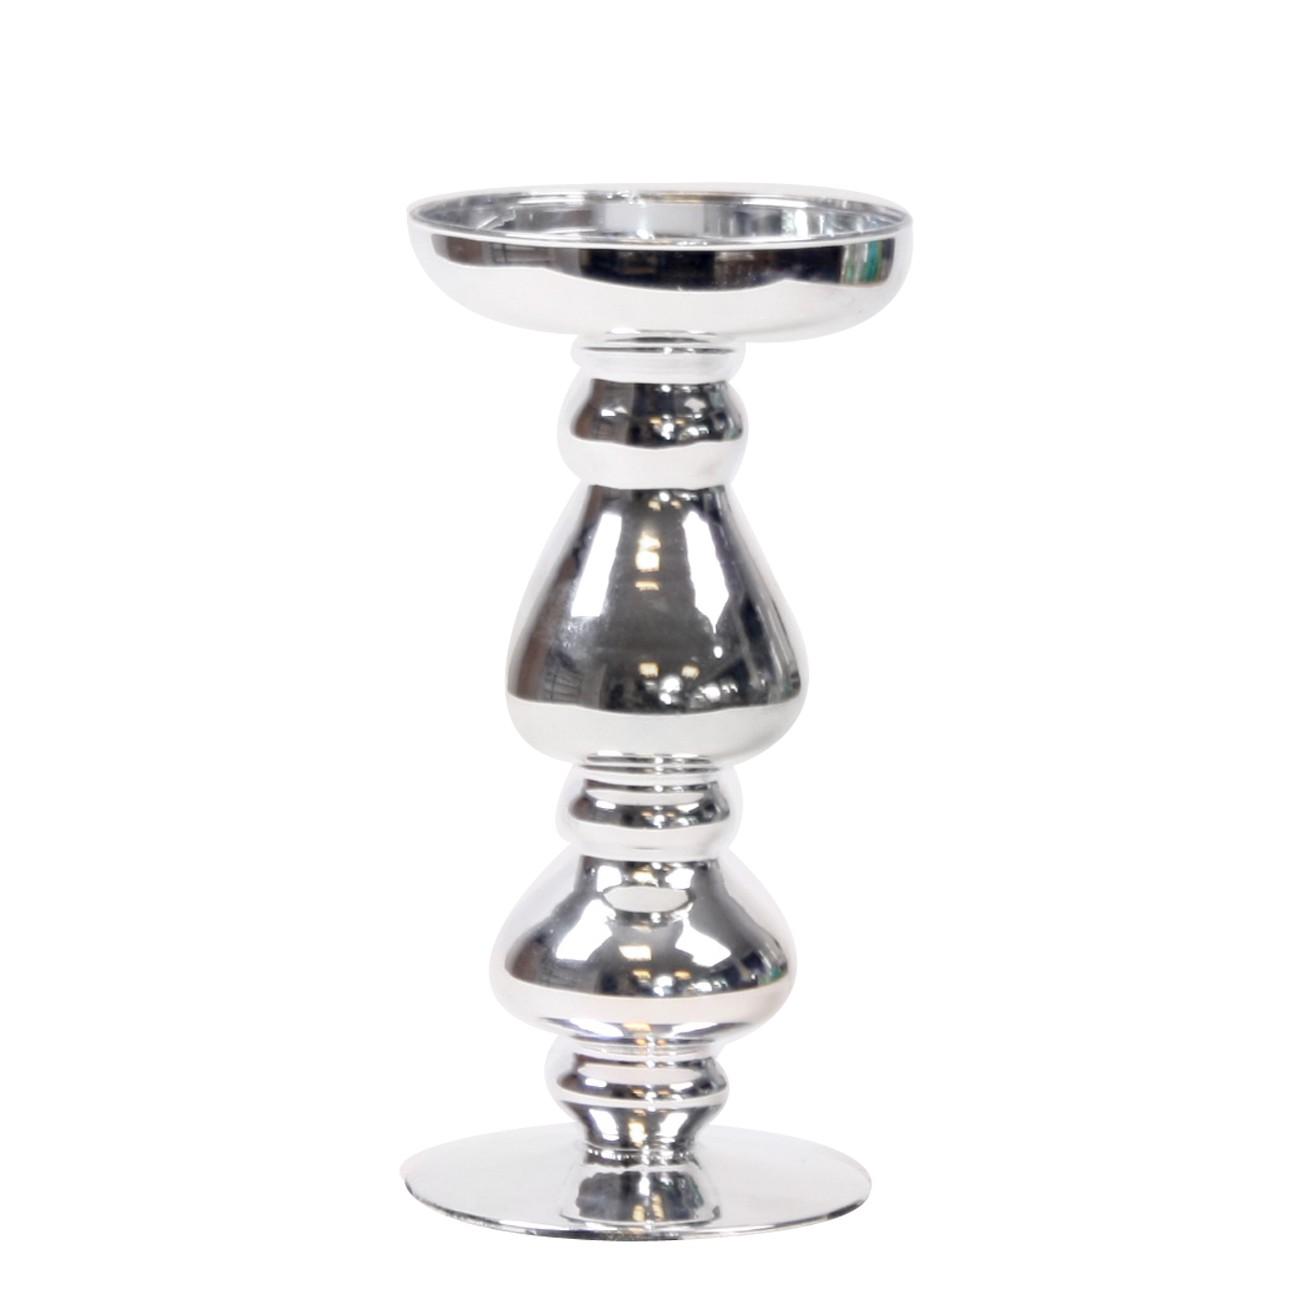 Glas kerzenhalter silber preis vergleich 2016 for Glas kerzenhalter